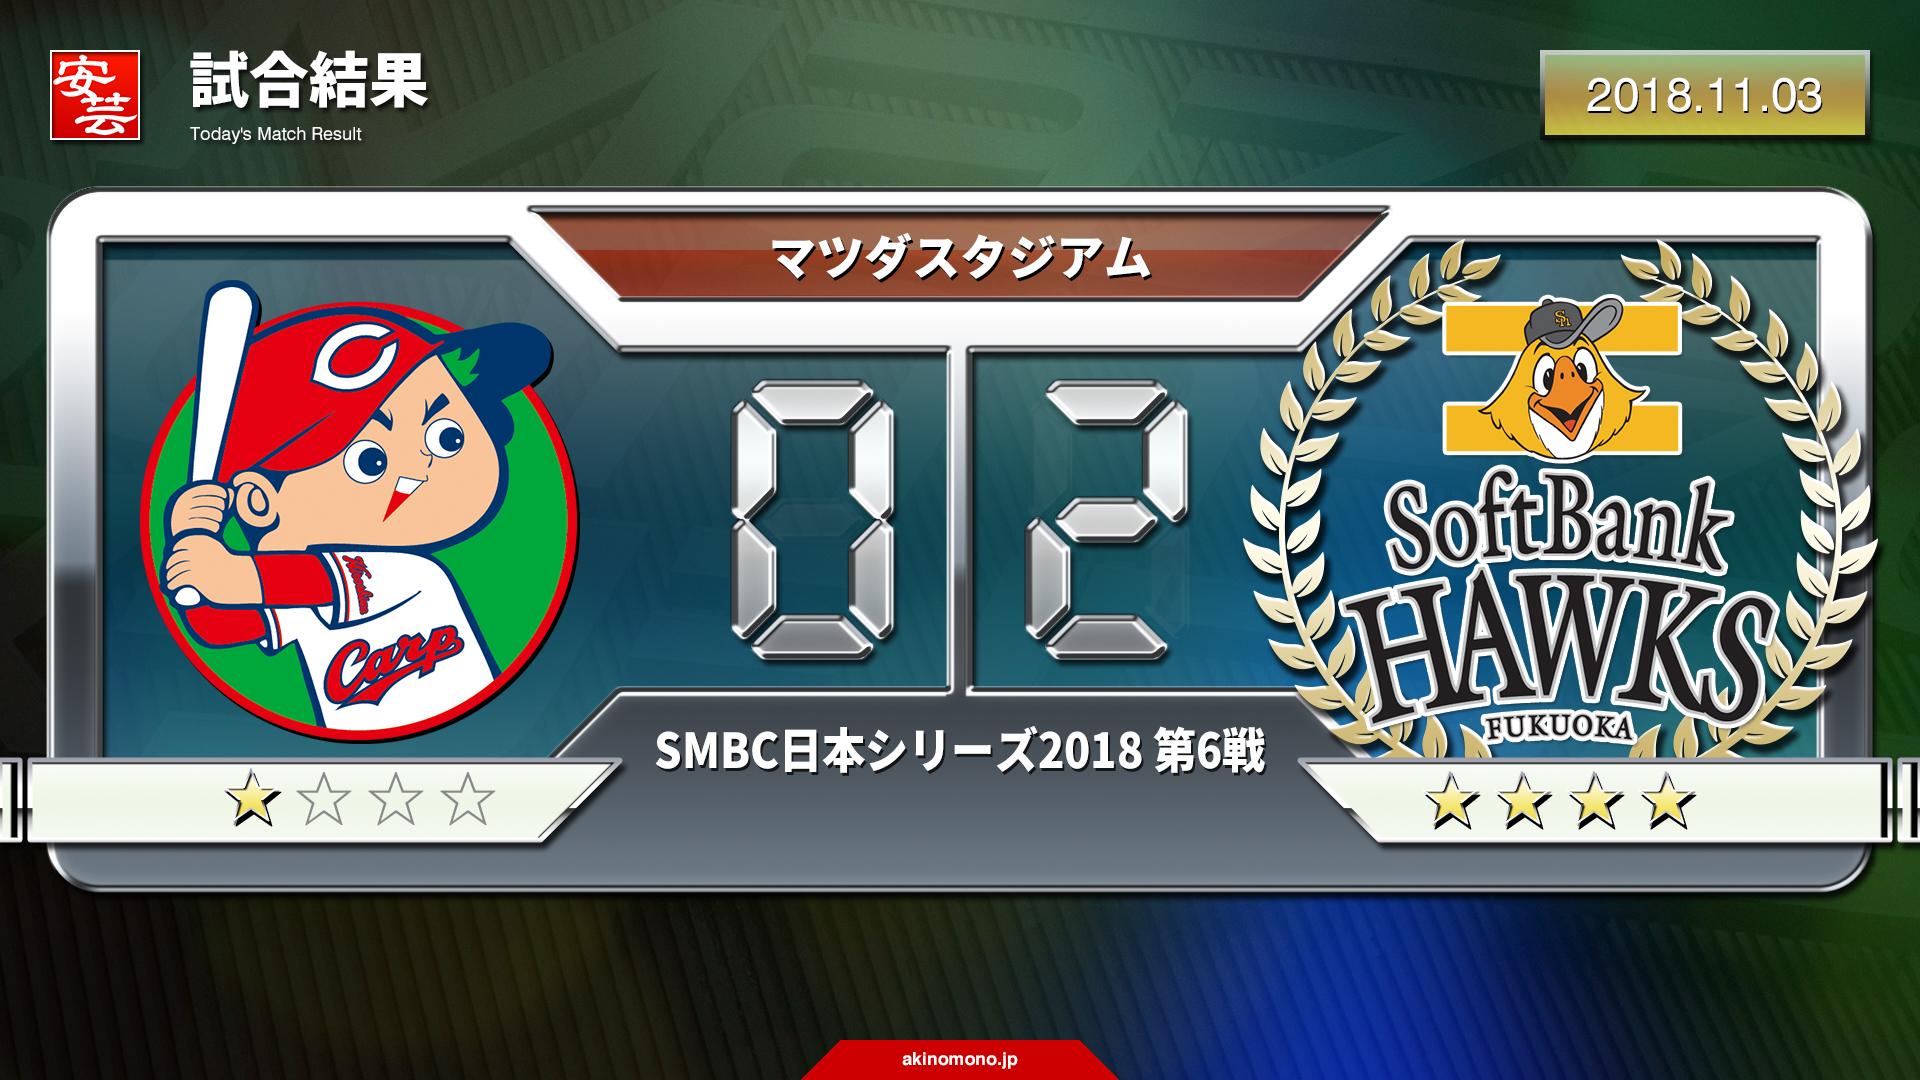 カープ 結果 広島 試合